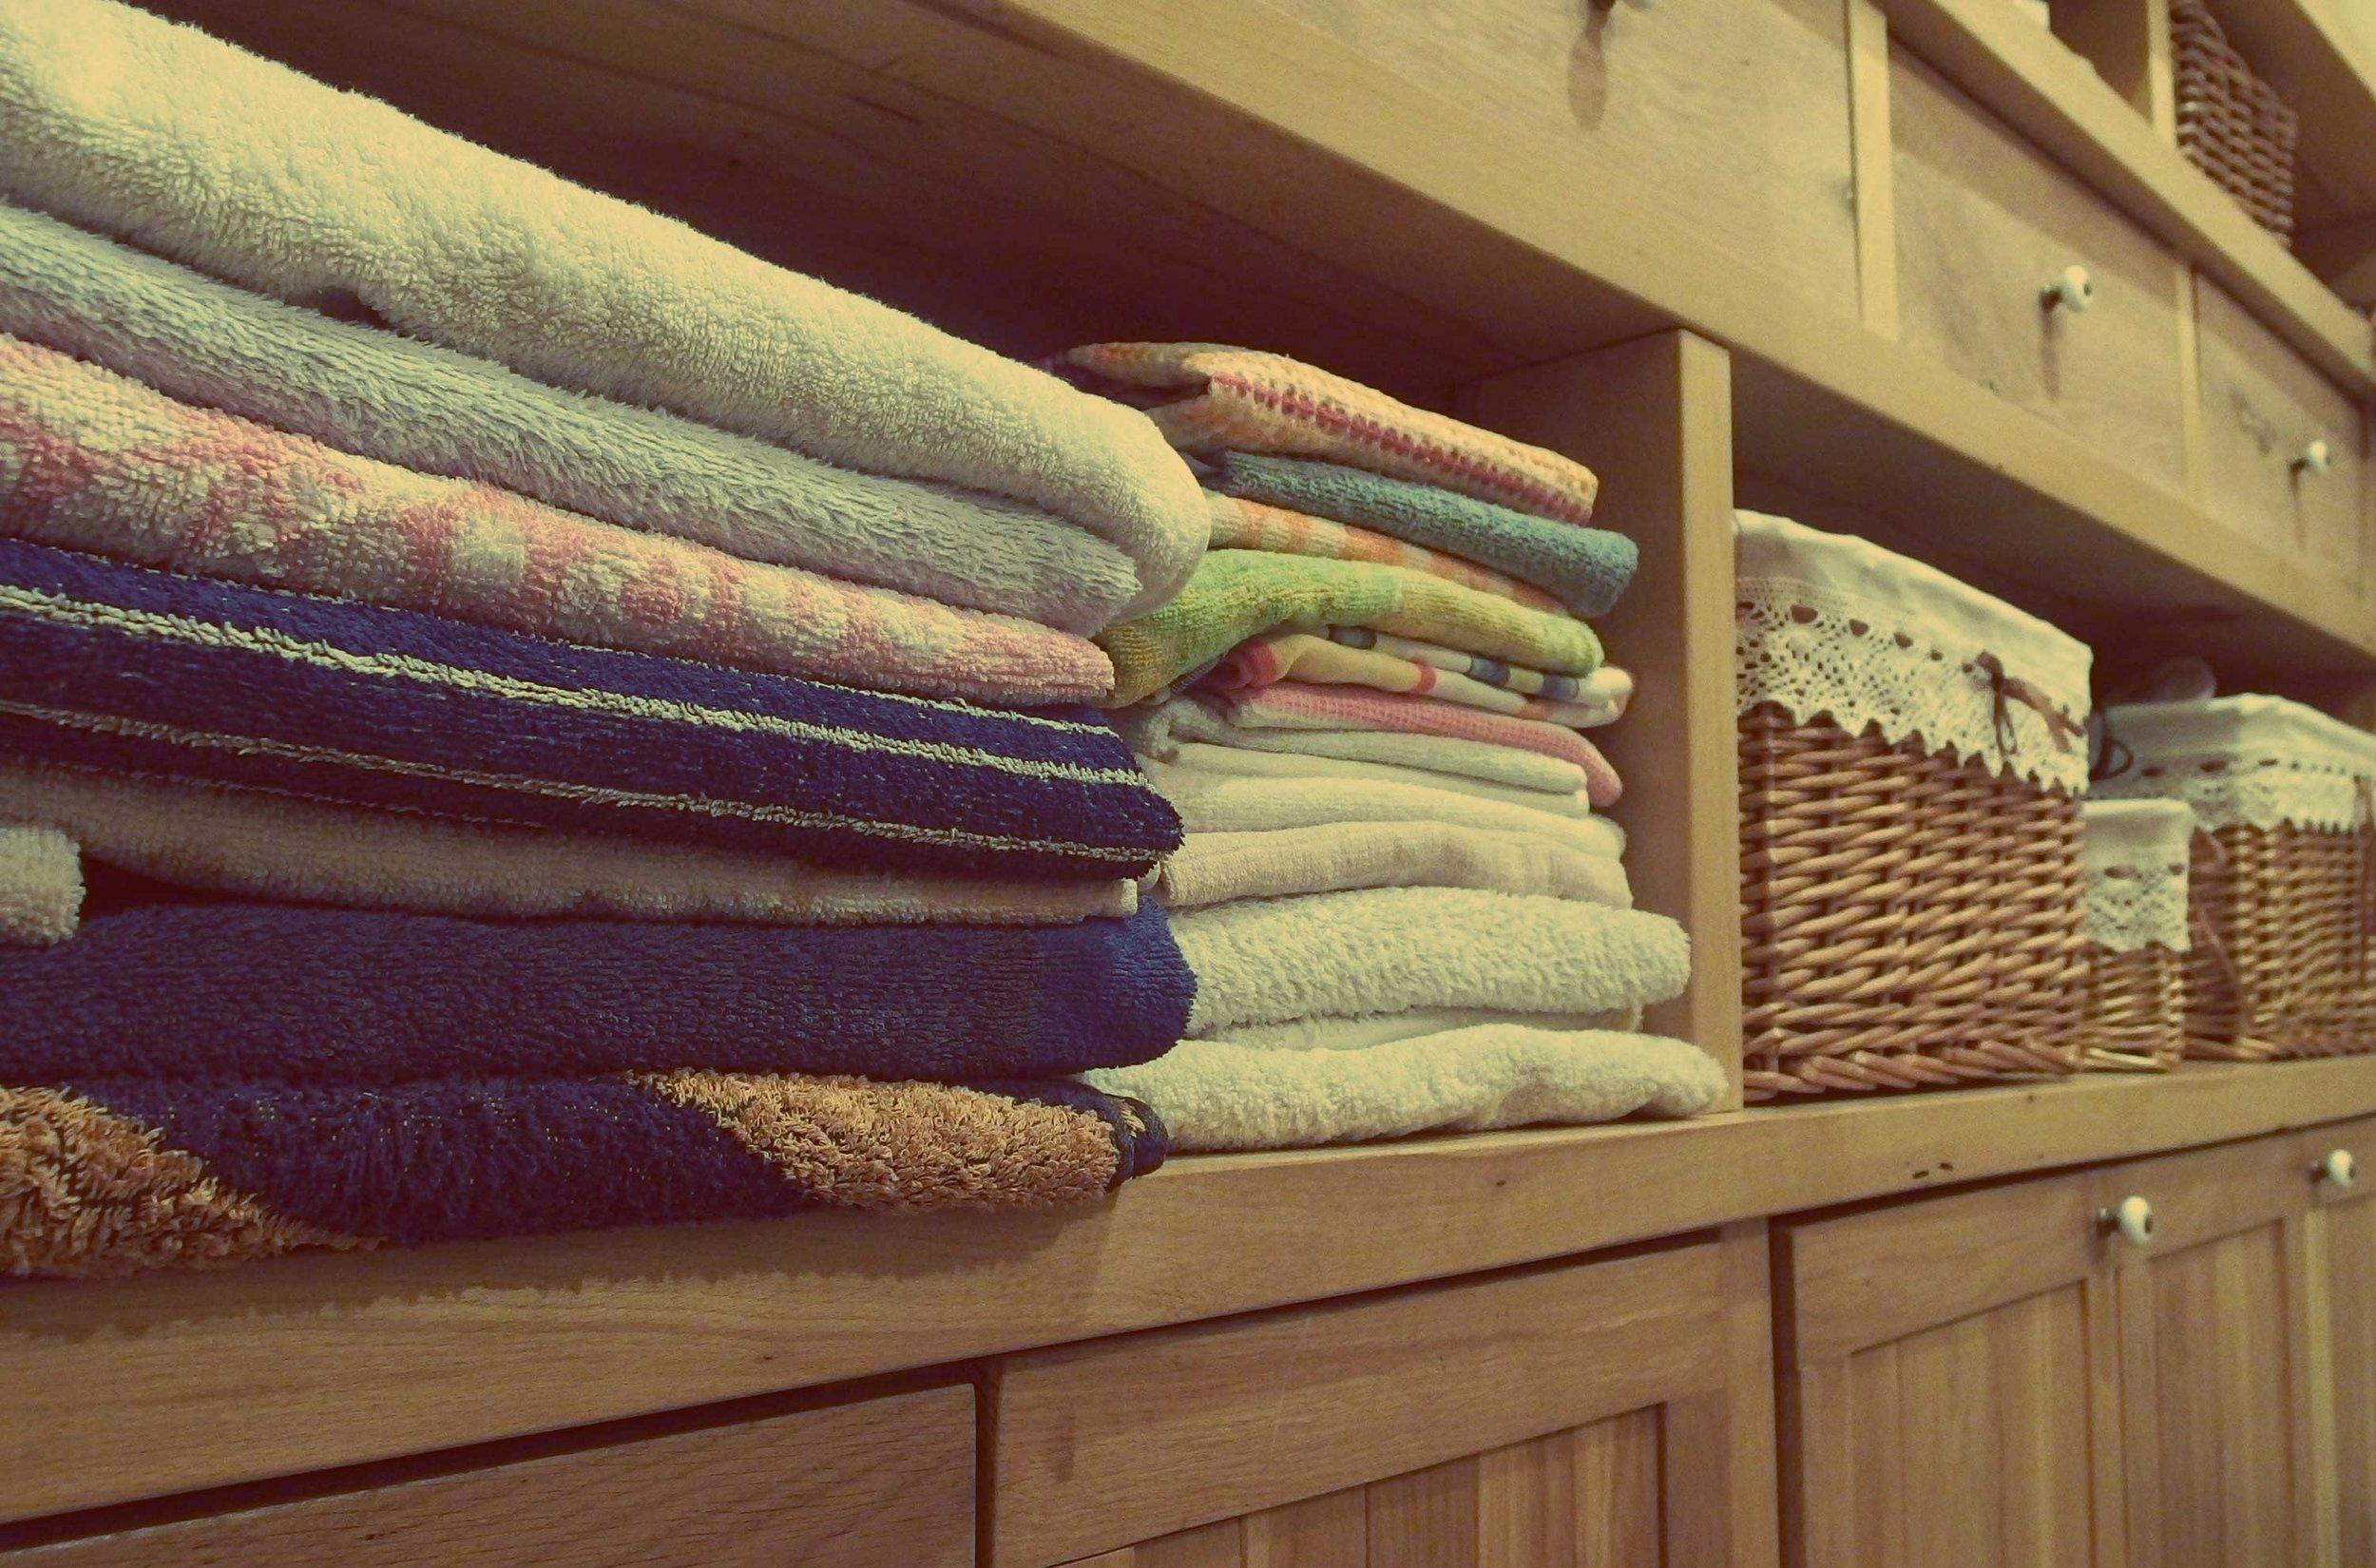 baskets-clean-color-271711.jpg